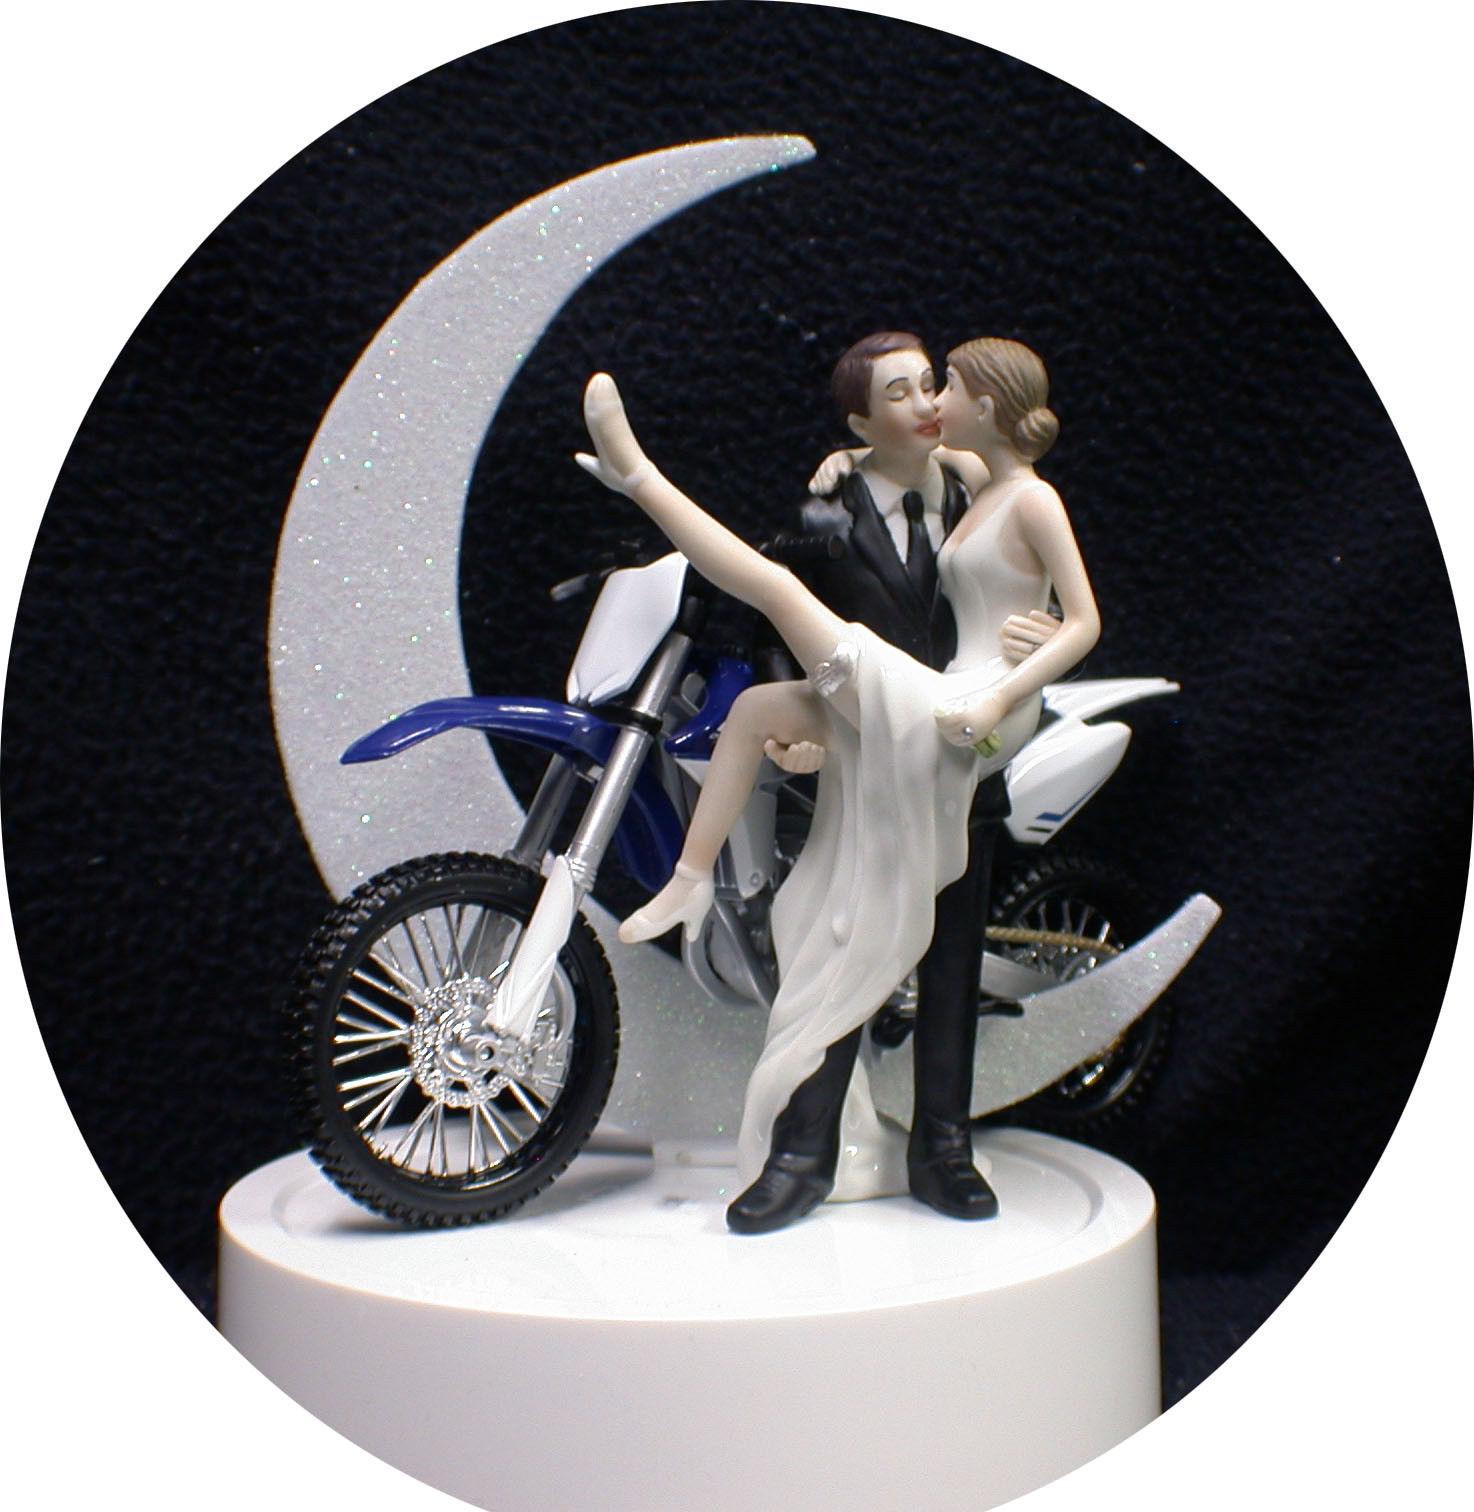 Yamaha Off Road Dirt Bike Motorcycle wedding and 50 similar items